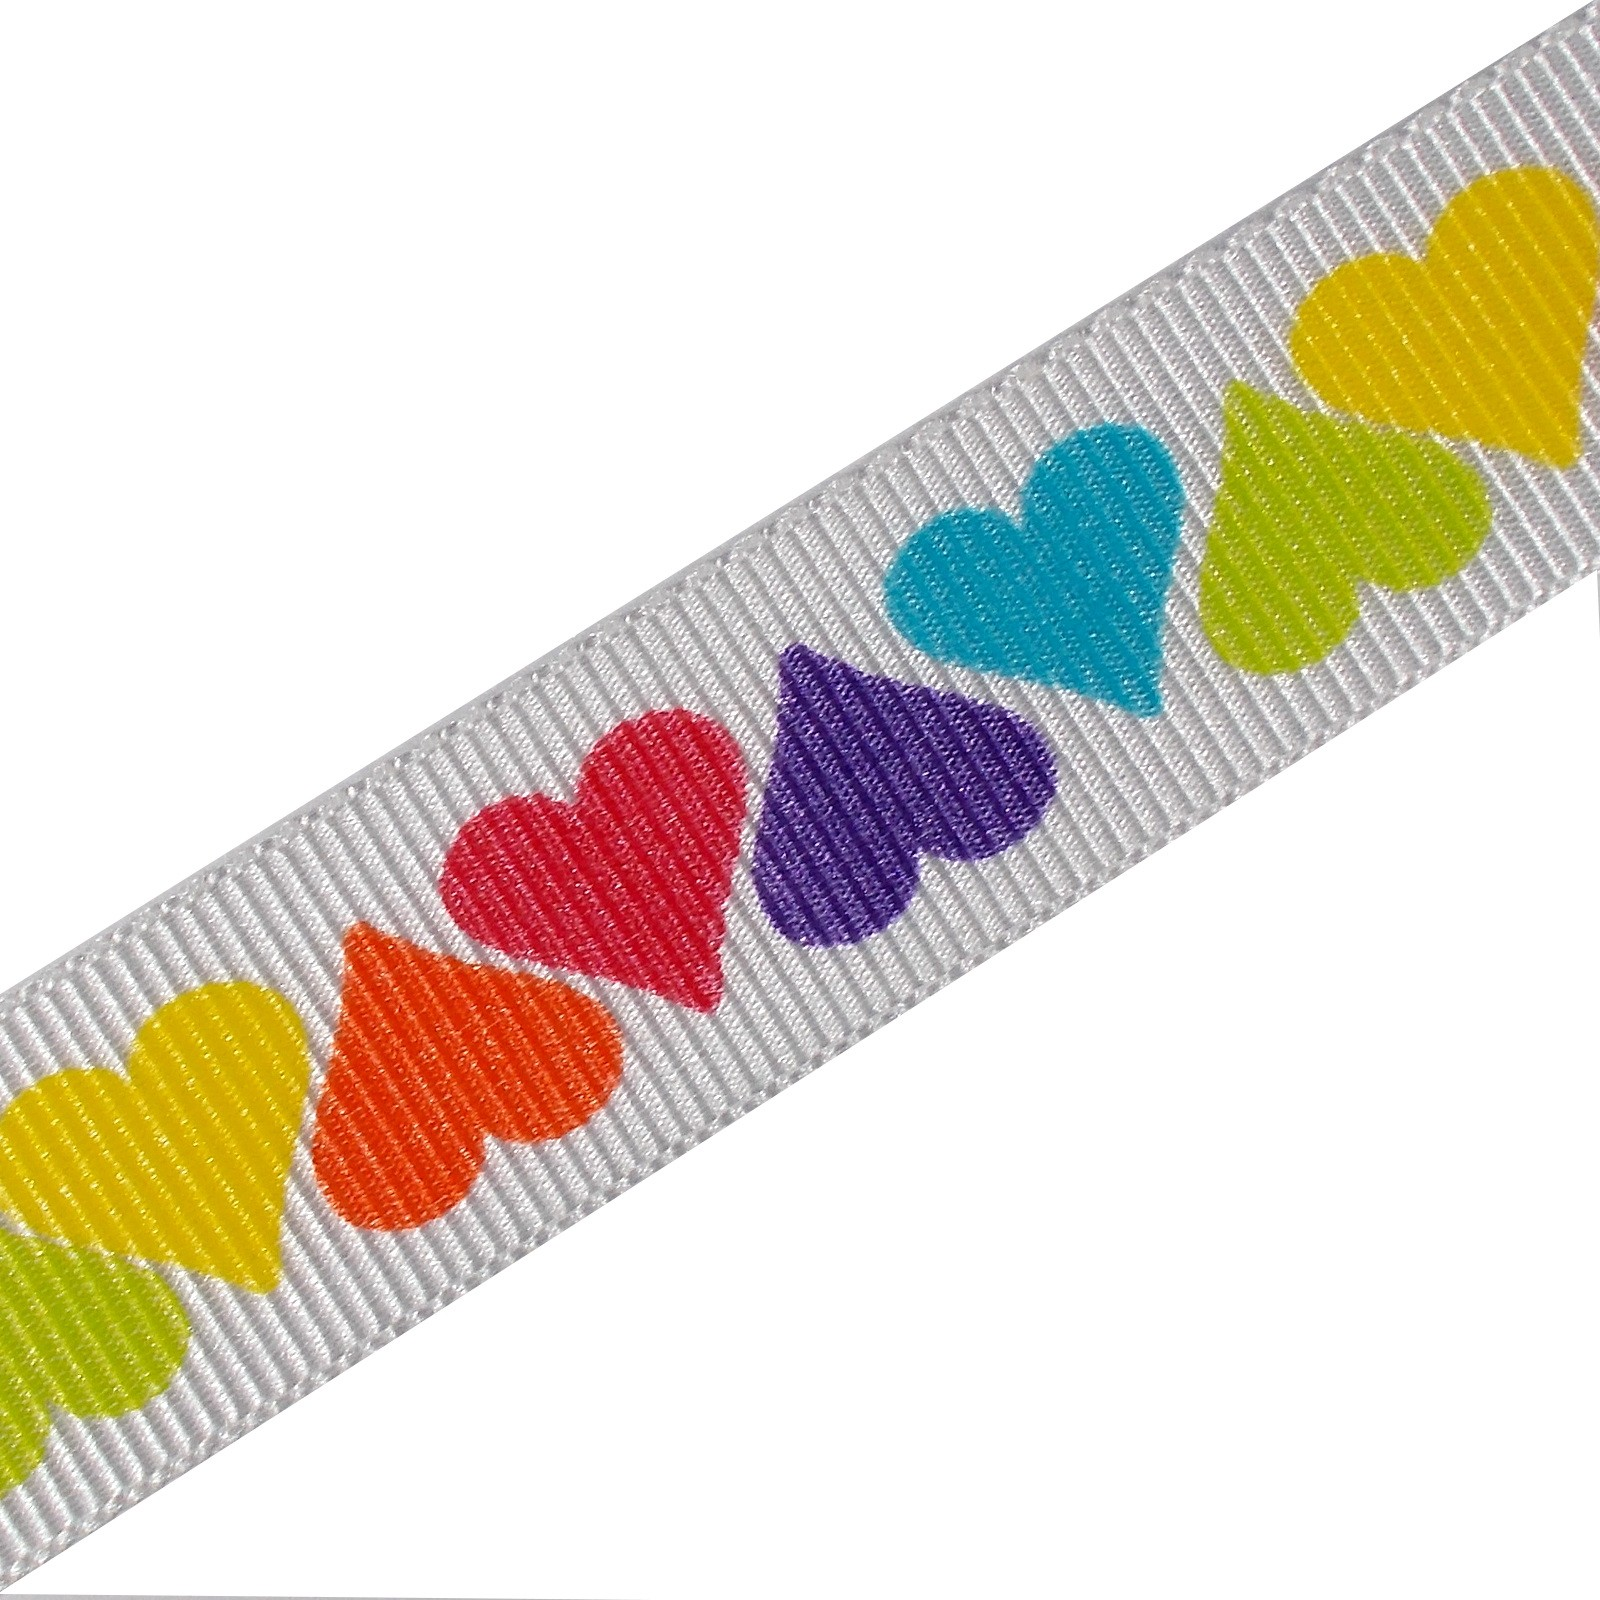 Berisfords Bright Rainbow Grosgrain Ribbon 16mm wide Hearts 1 metre length